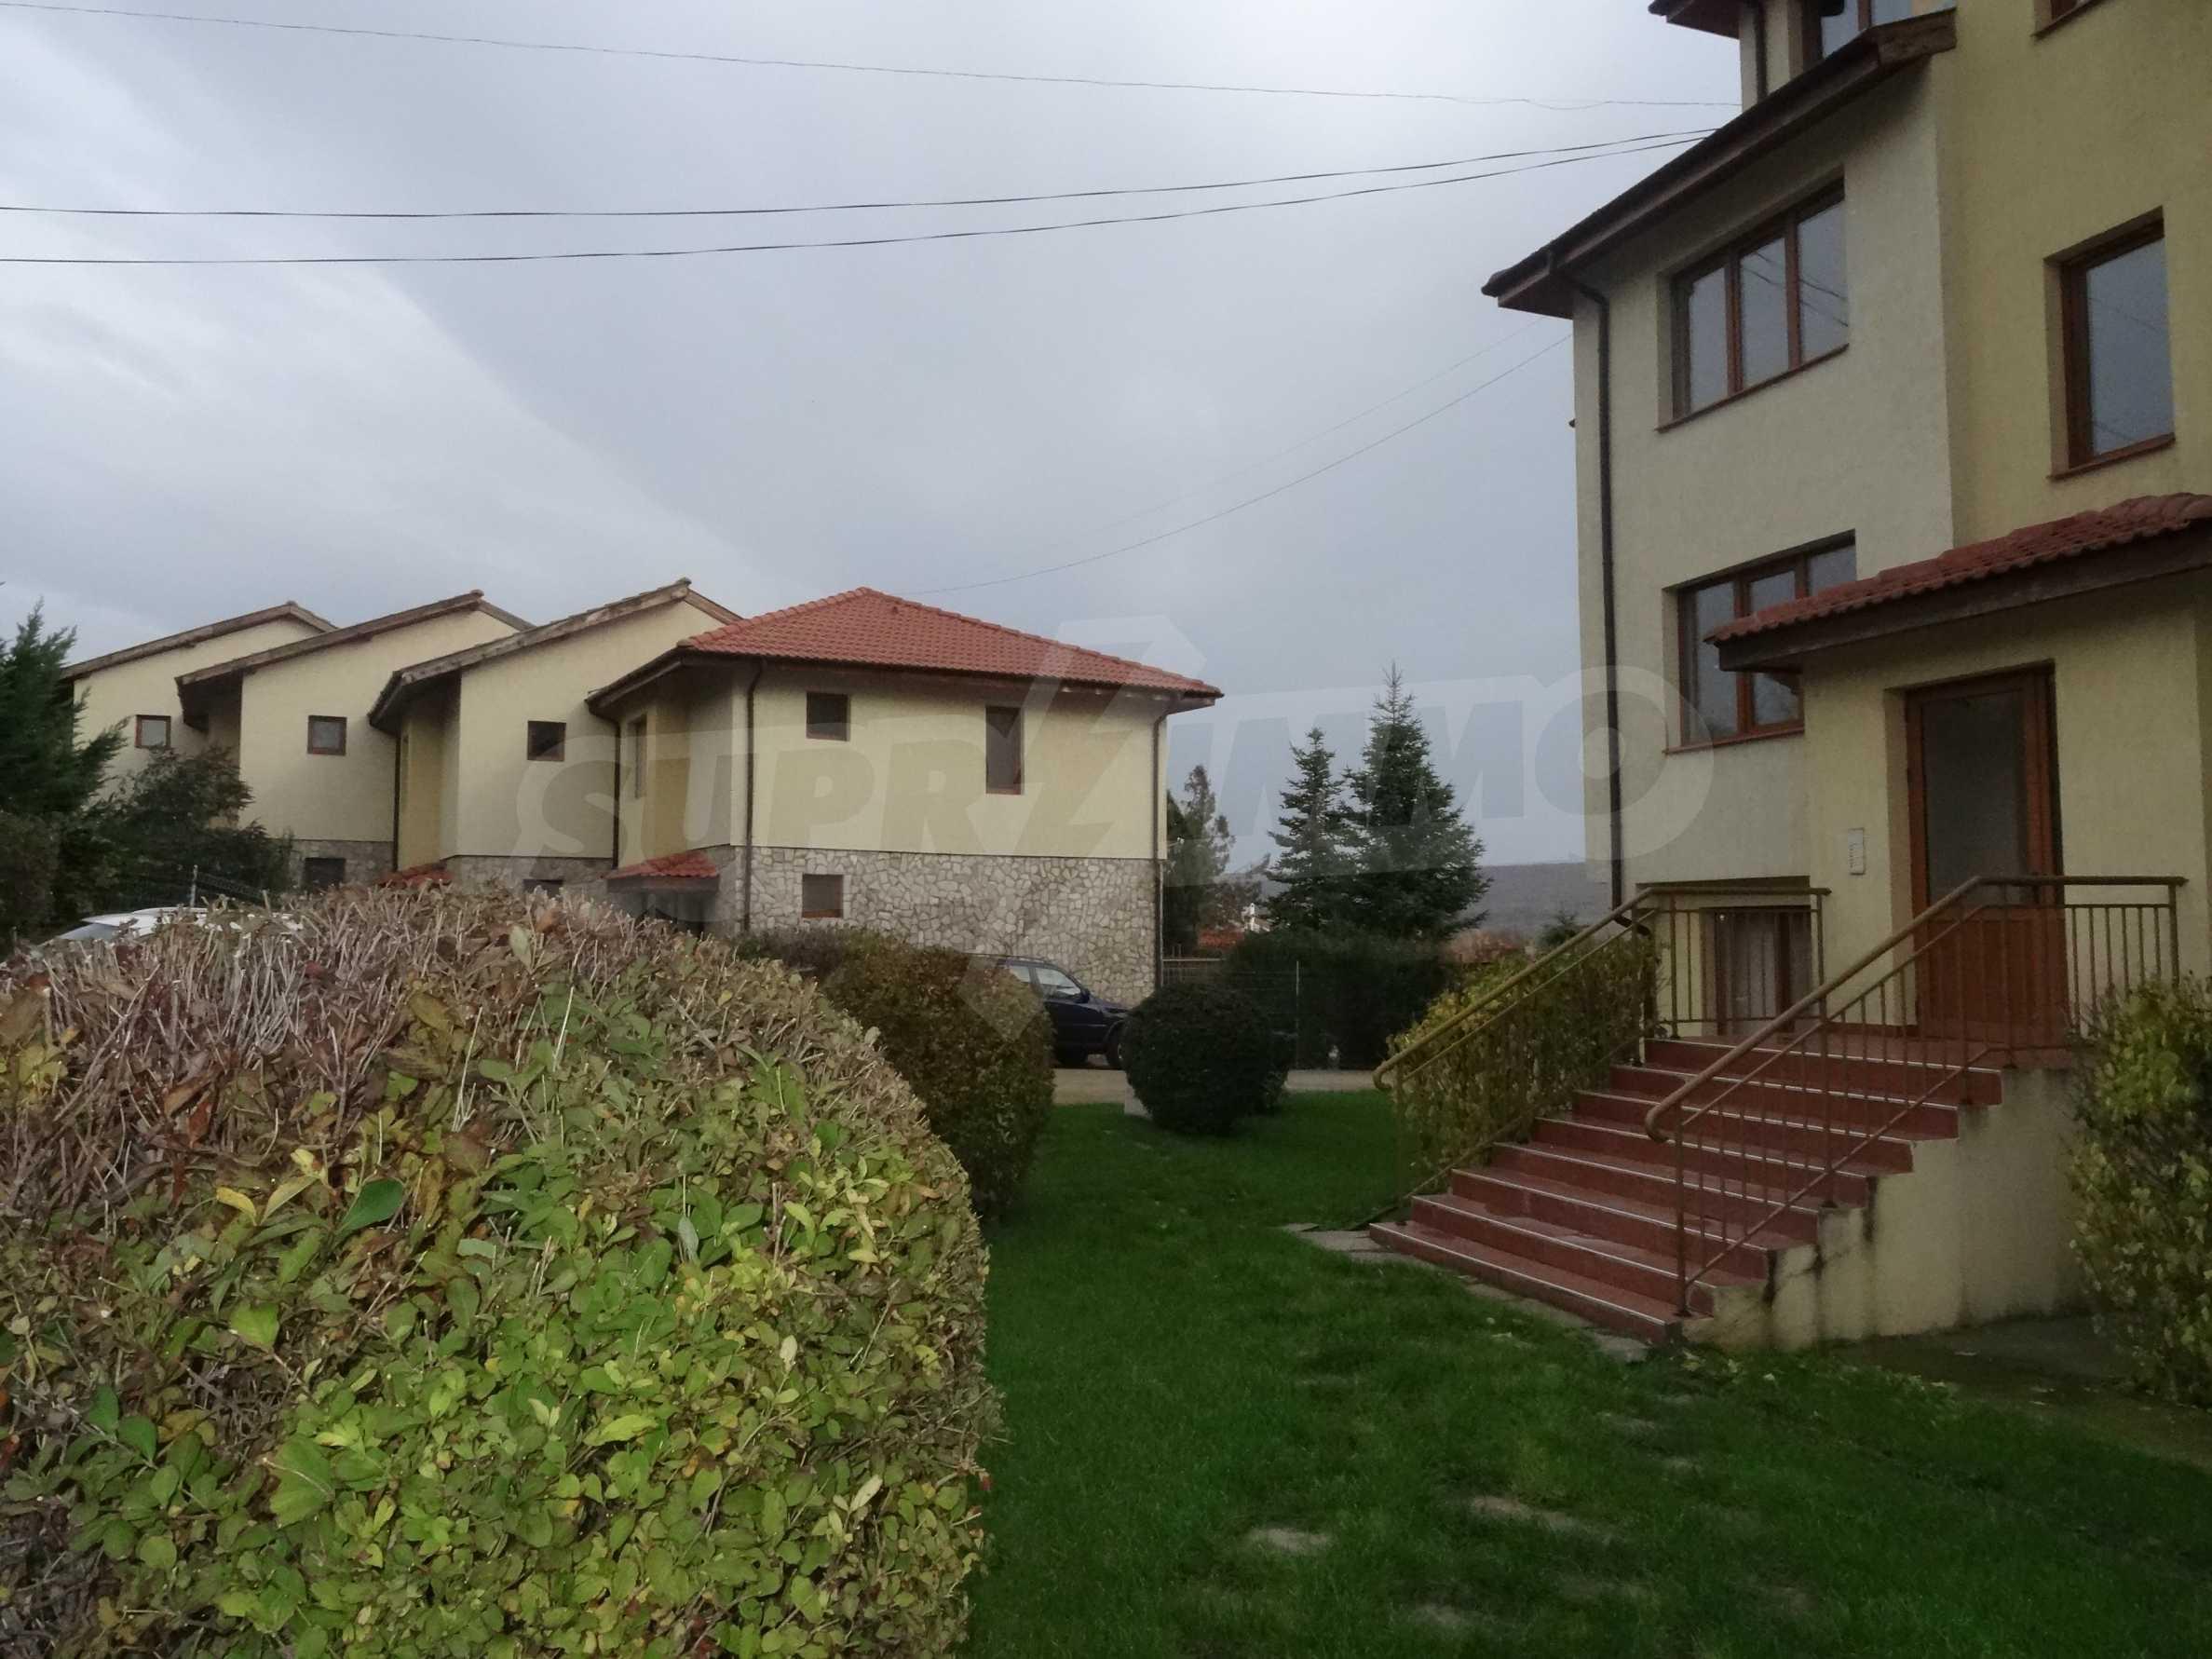 Тристаен апартамент до ключ близо до курорти Албена и Кранево 11